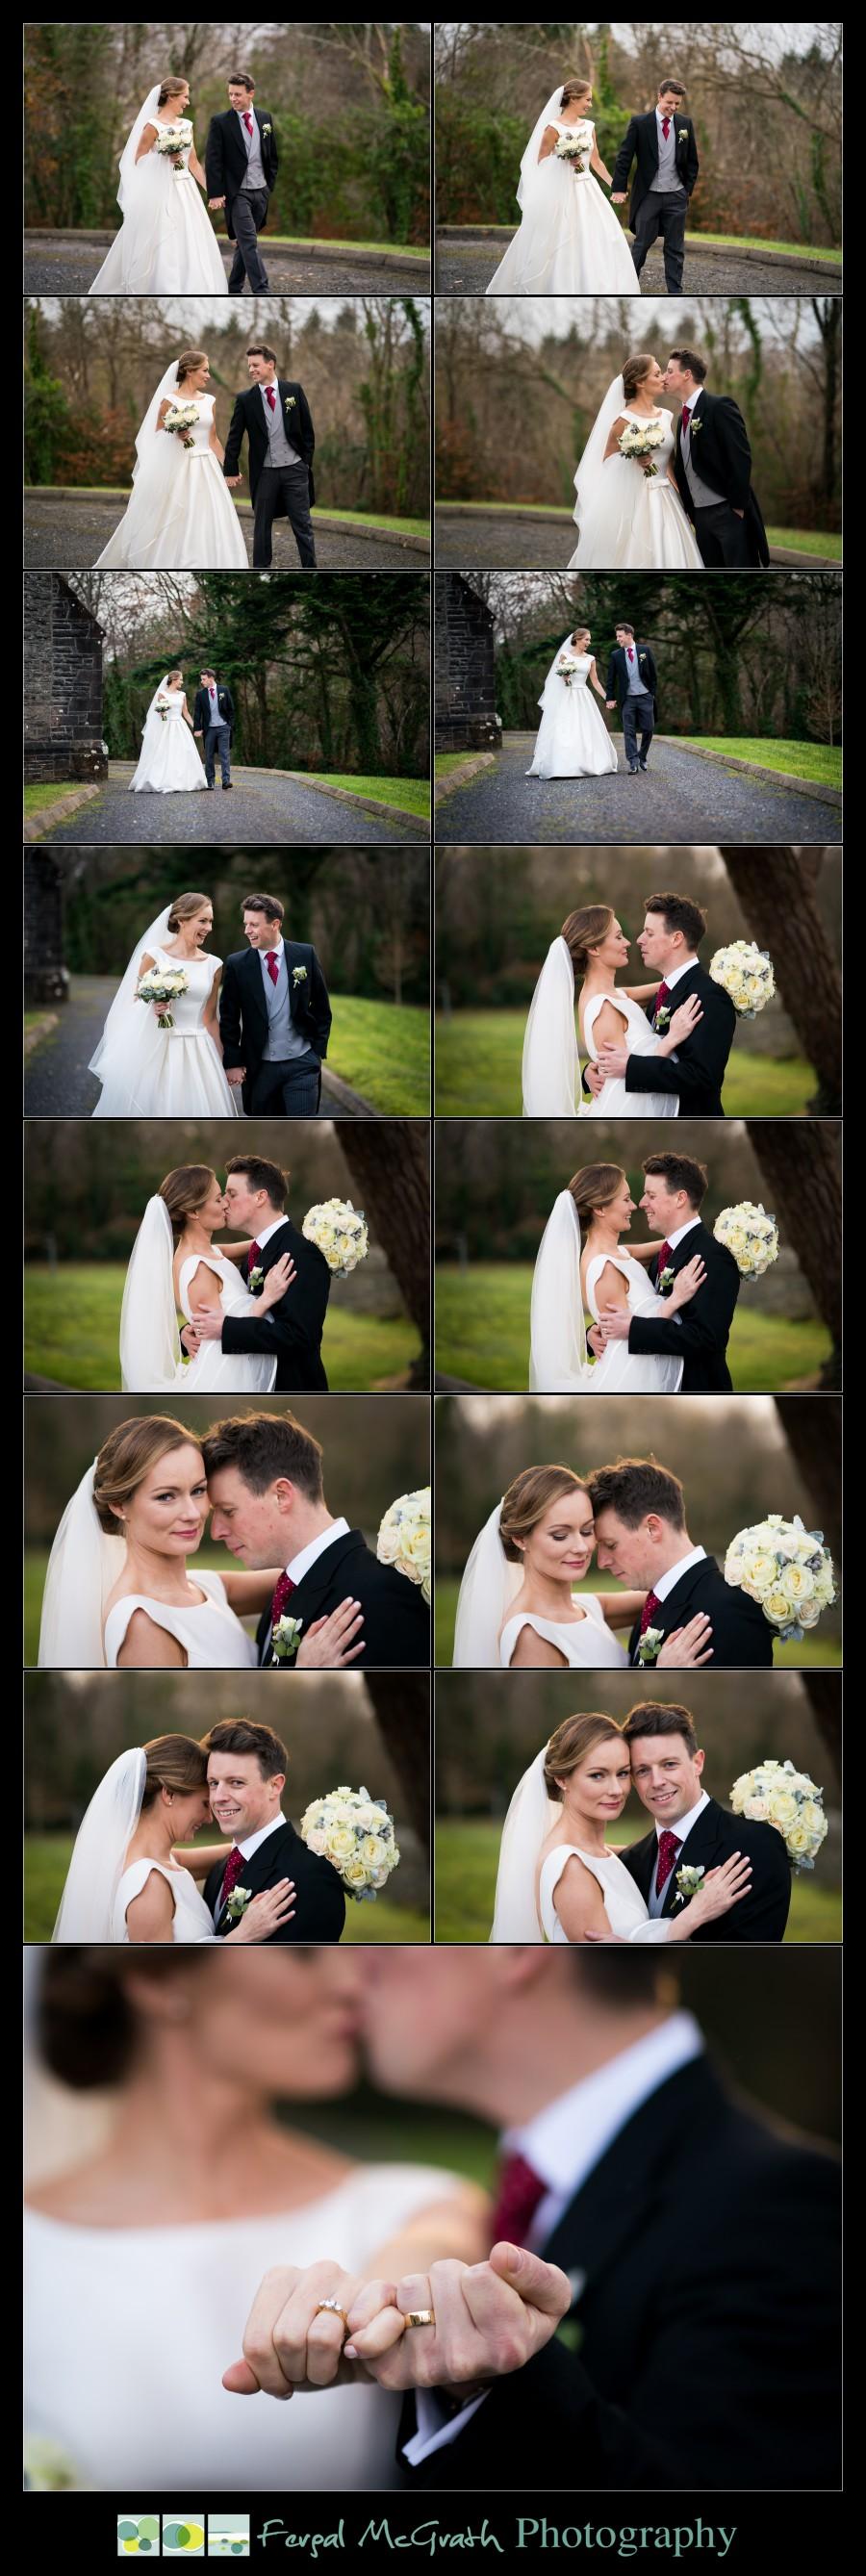 Harveys Point Hotel Winter Weddings beautiful bride and groom photos on the church grounds